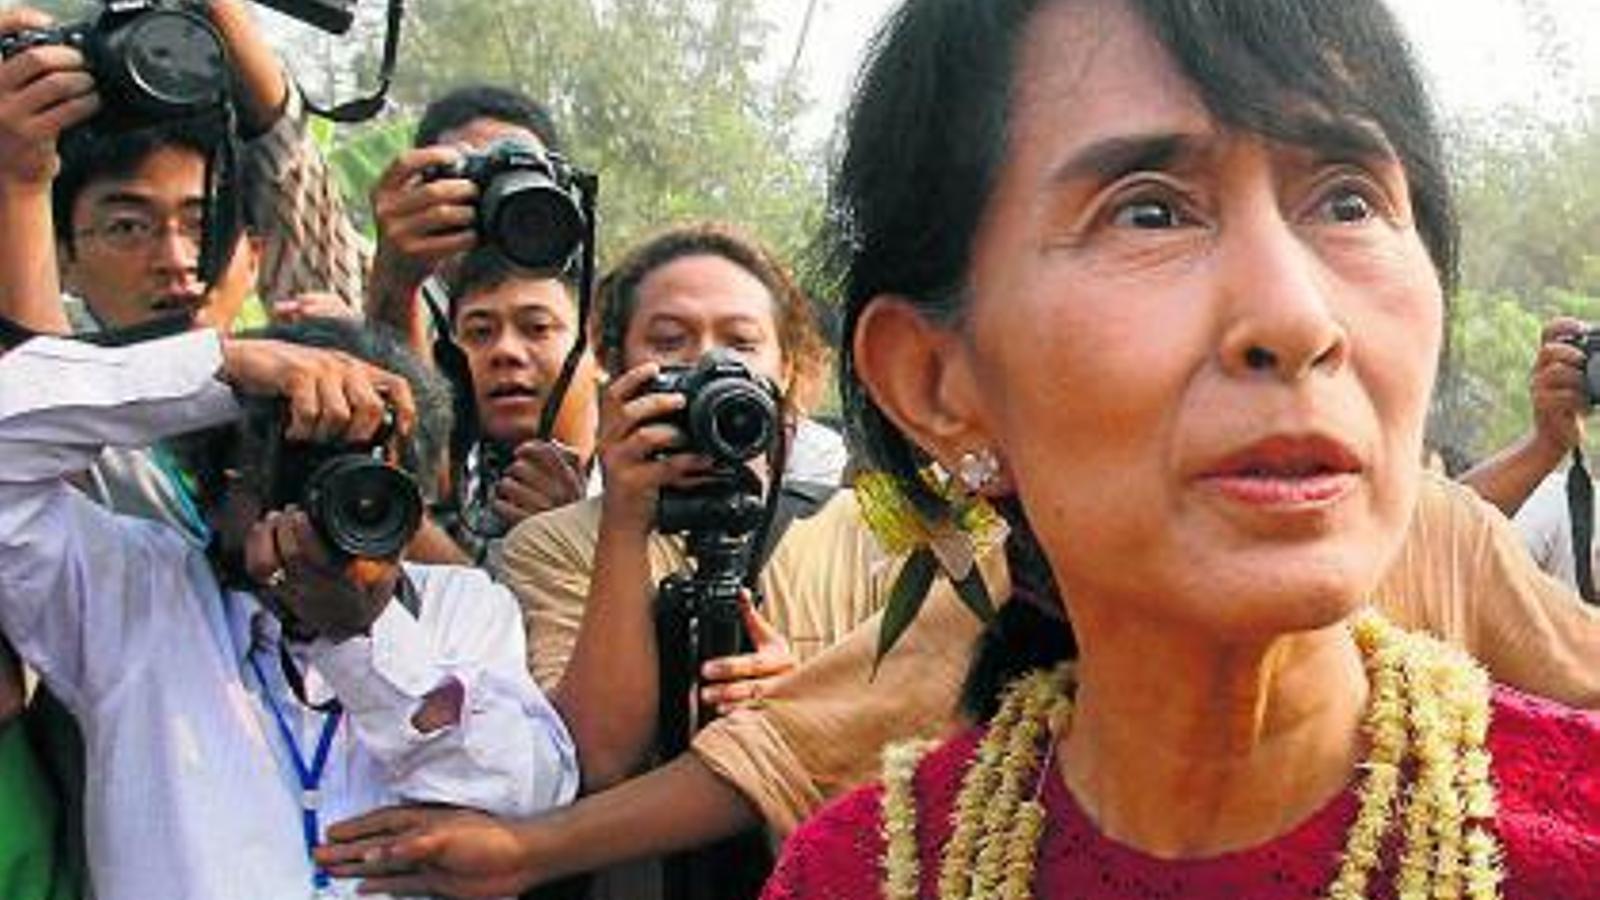 Aung San Suu Kyi, de dissident a diputada al Parlament birmà